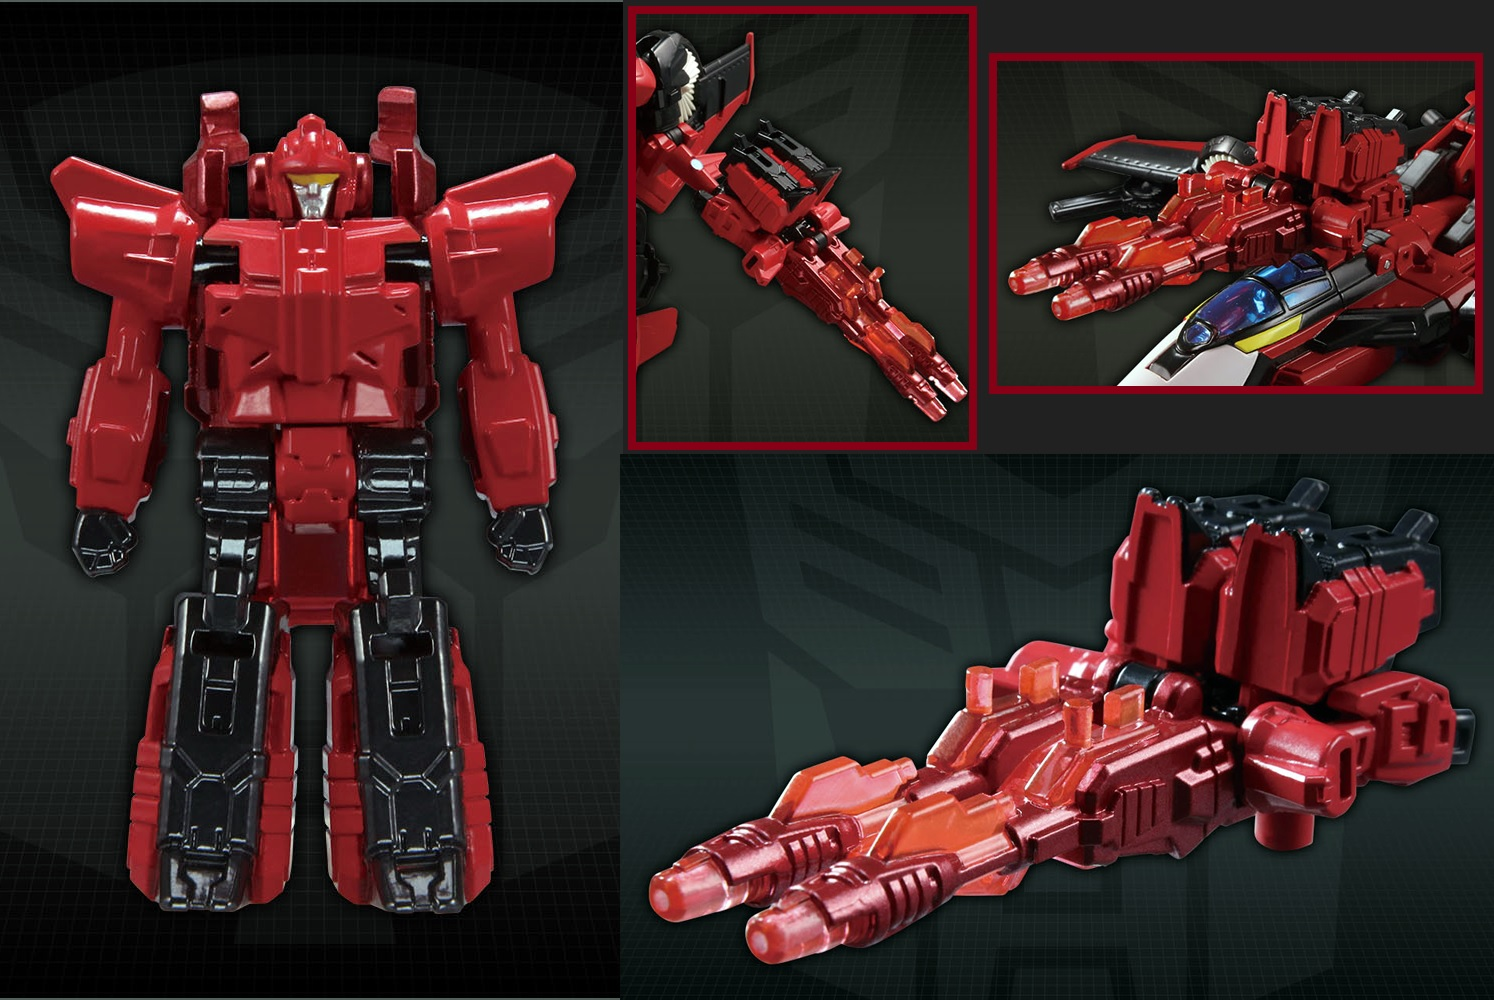 Takara Tomy Transformers Legends LG-62 Windblade Targetmaster Pointech LG62 SALE